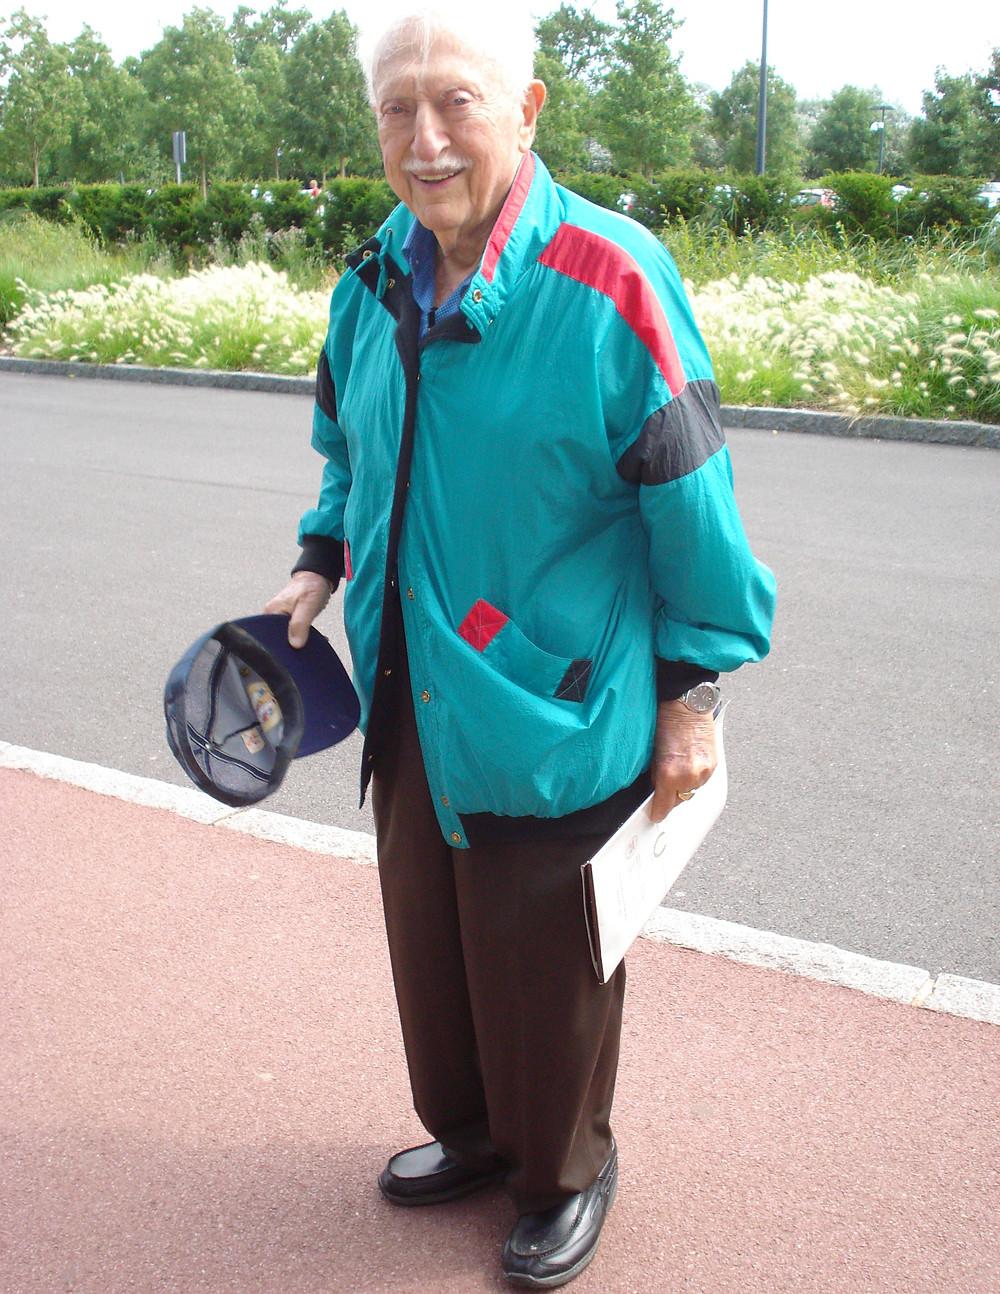 Bob, the veteran on the river cruise